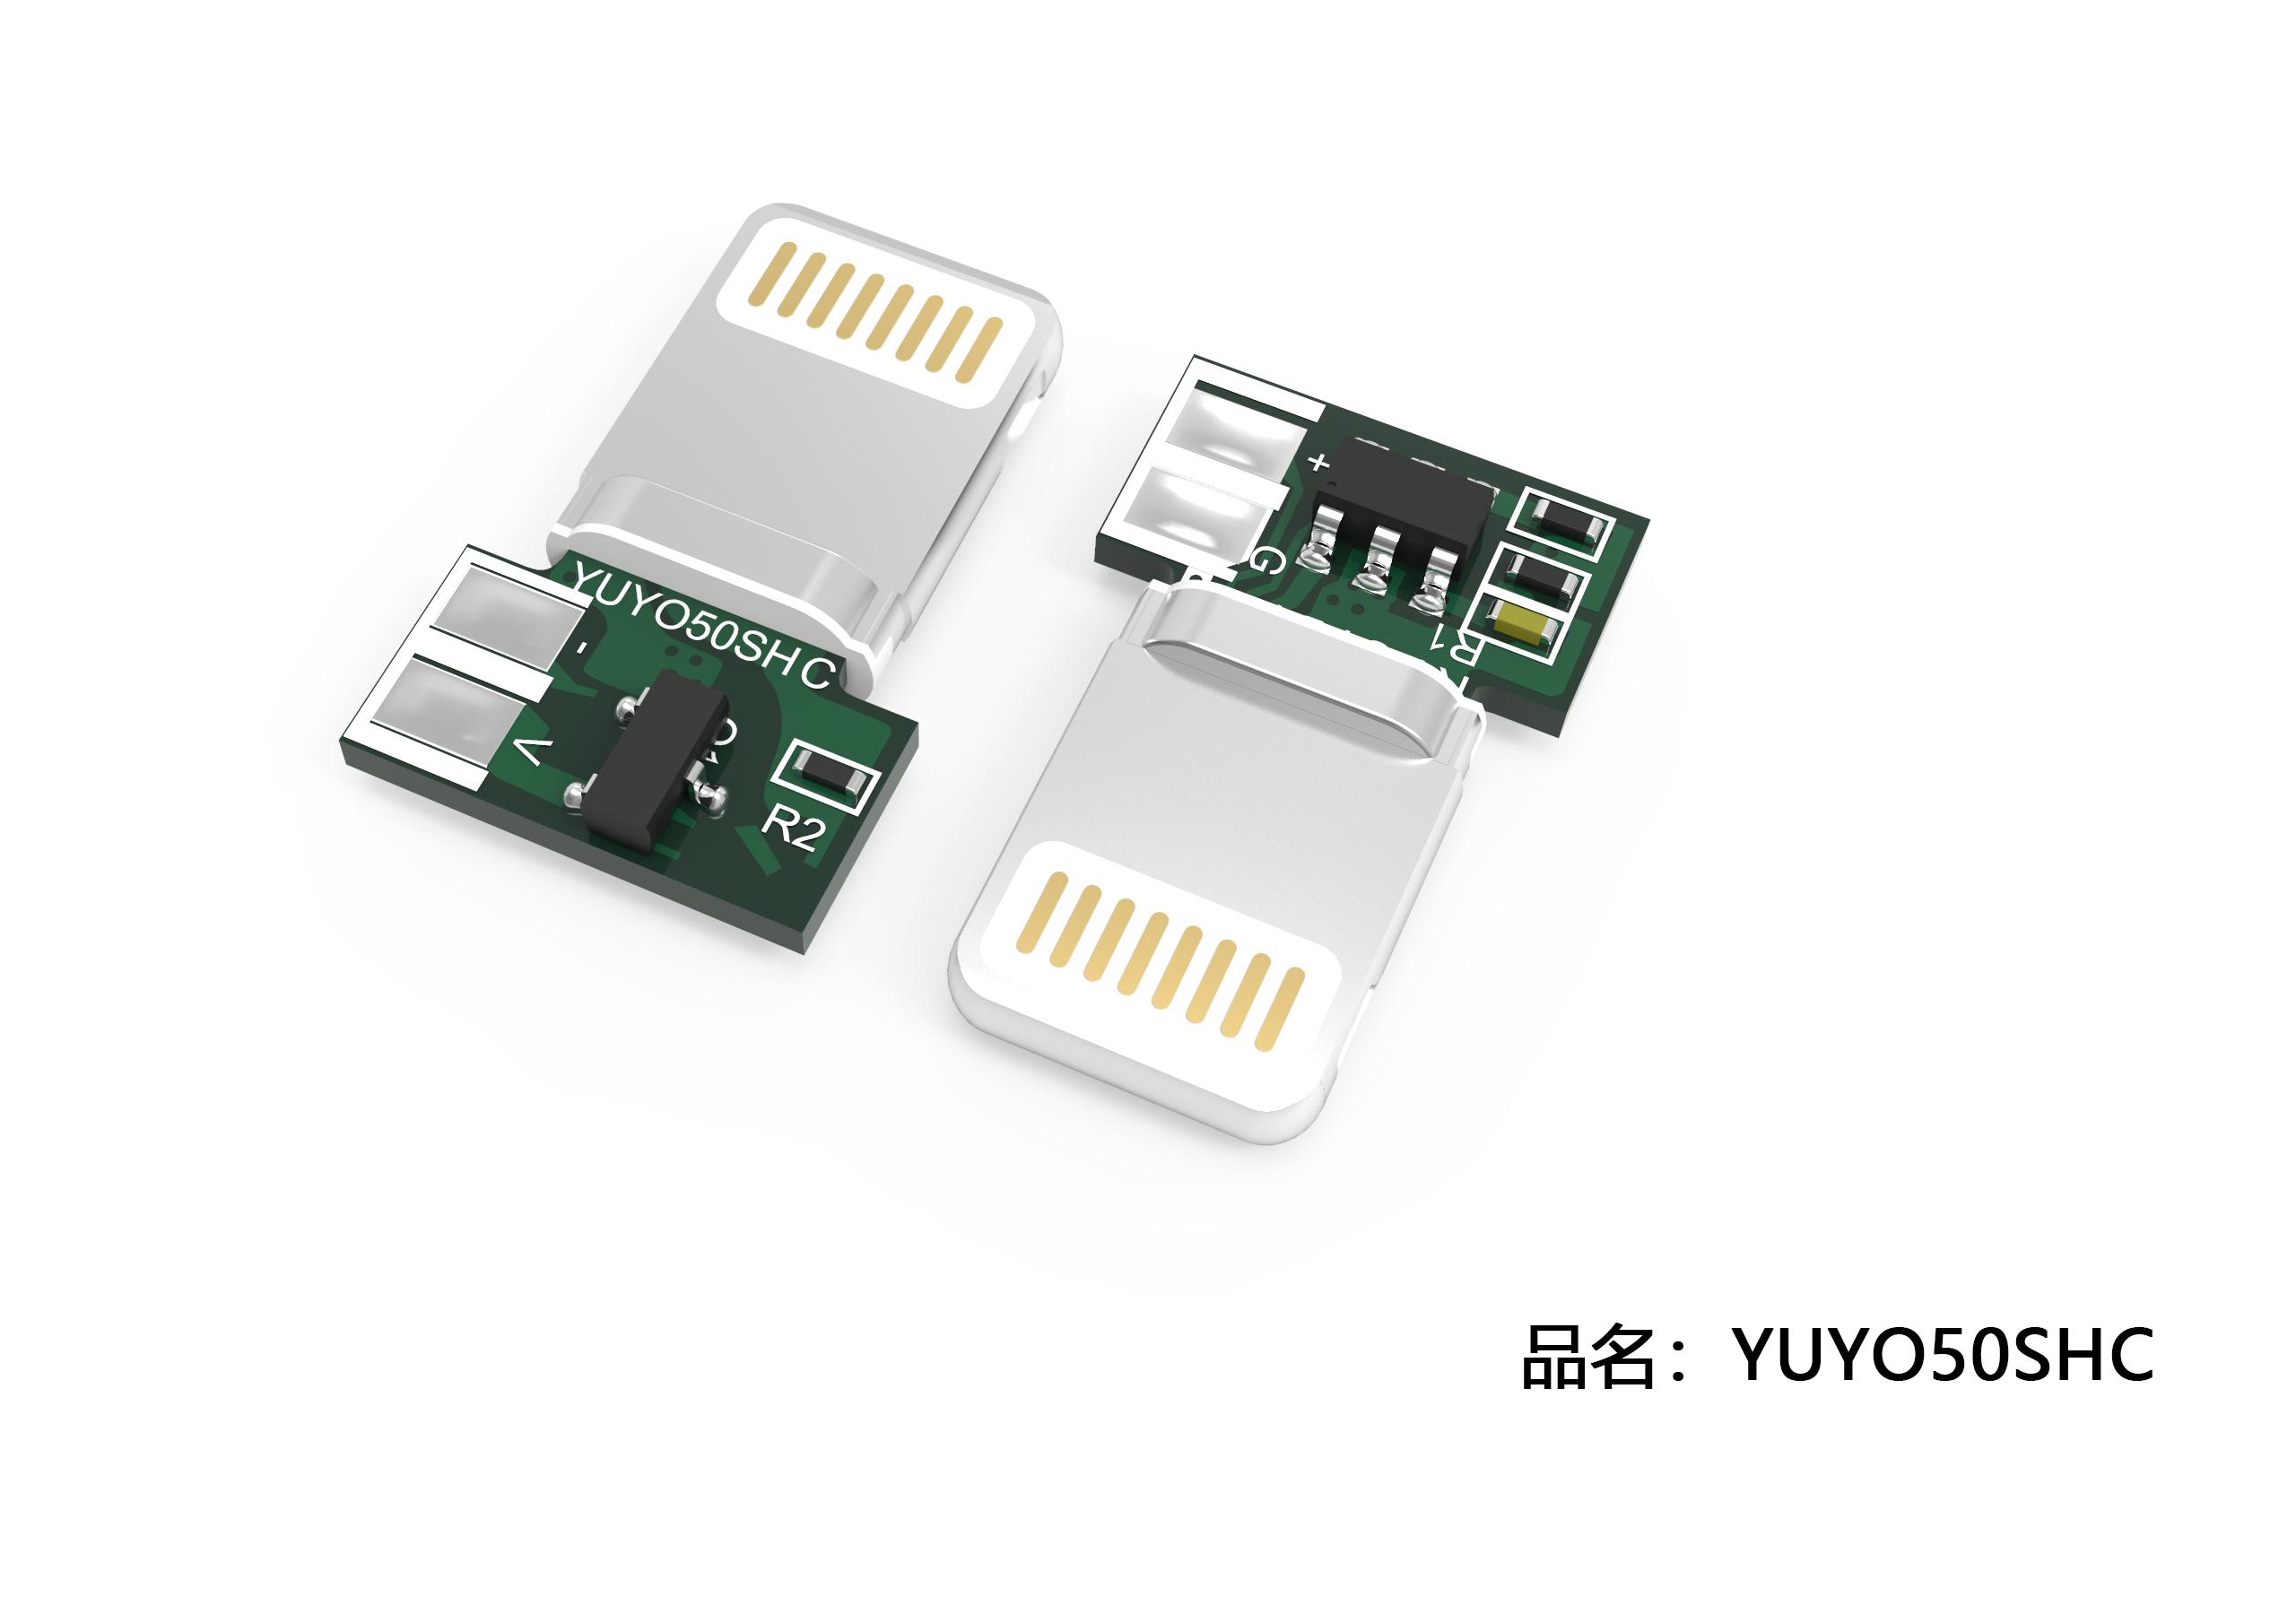 YUYO50SHC